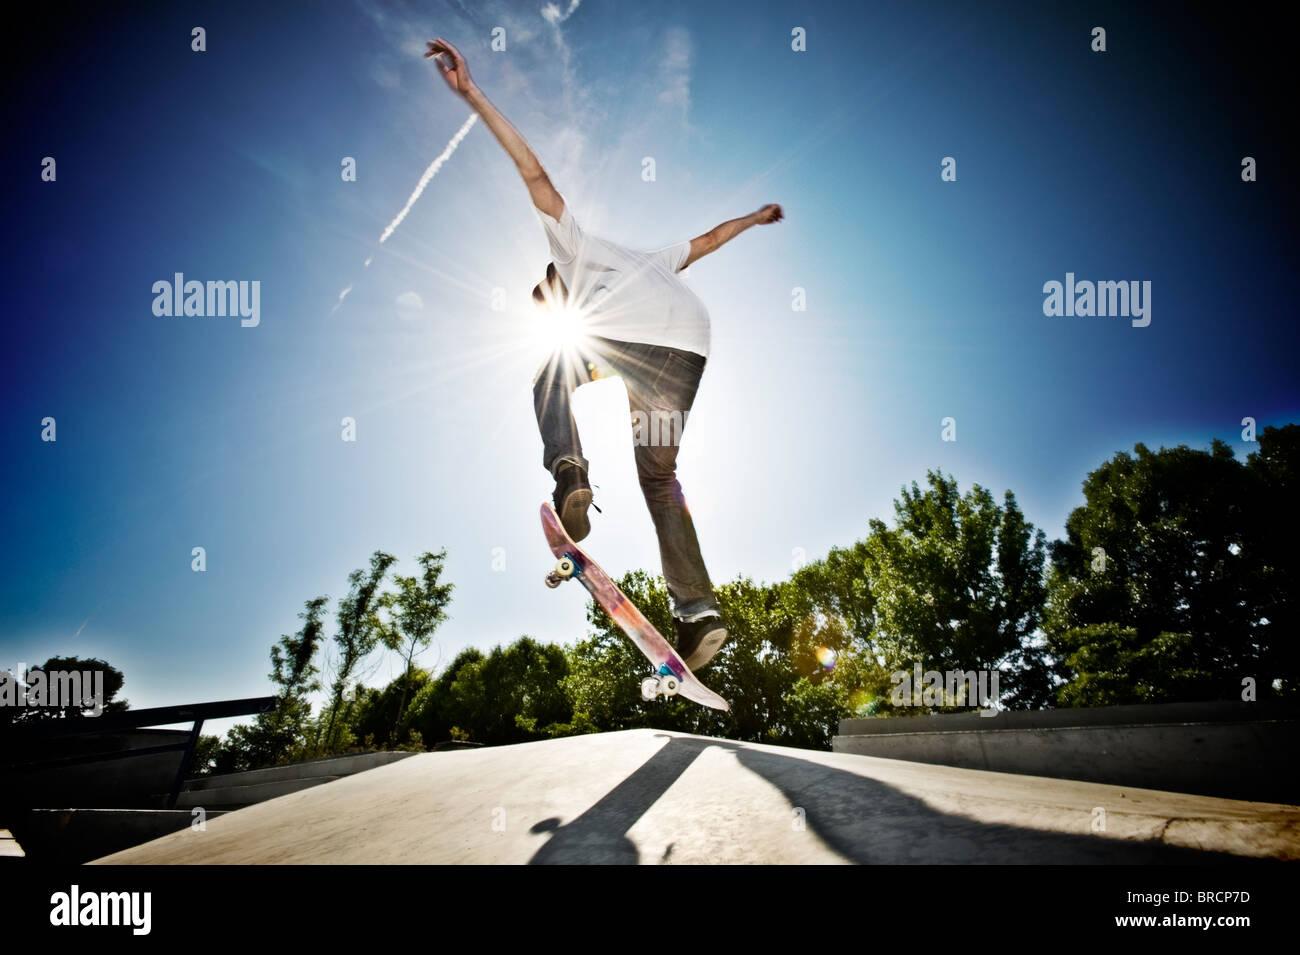 Skateboarder einen Skateboard Trick zu tun Stockbild